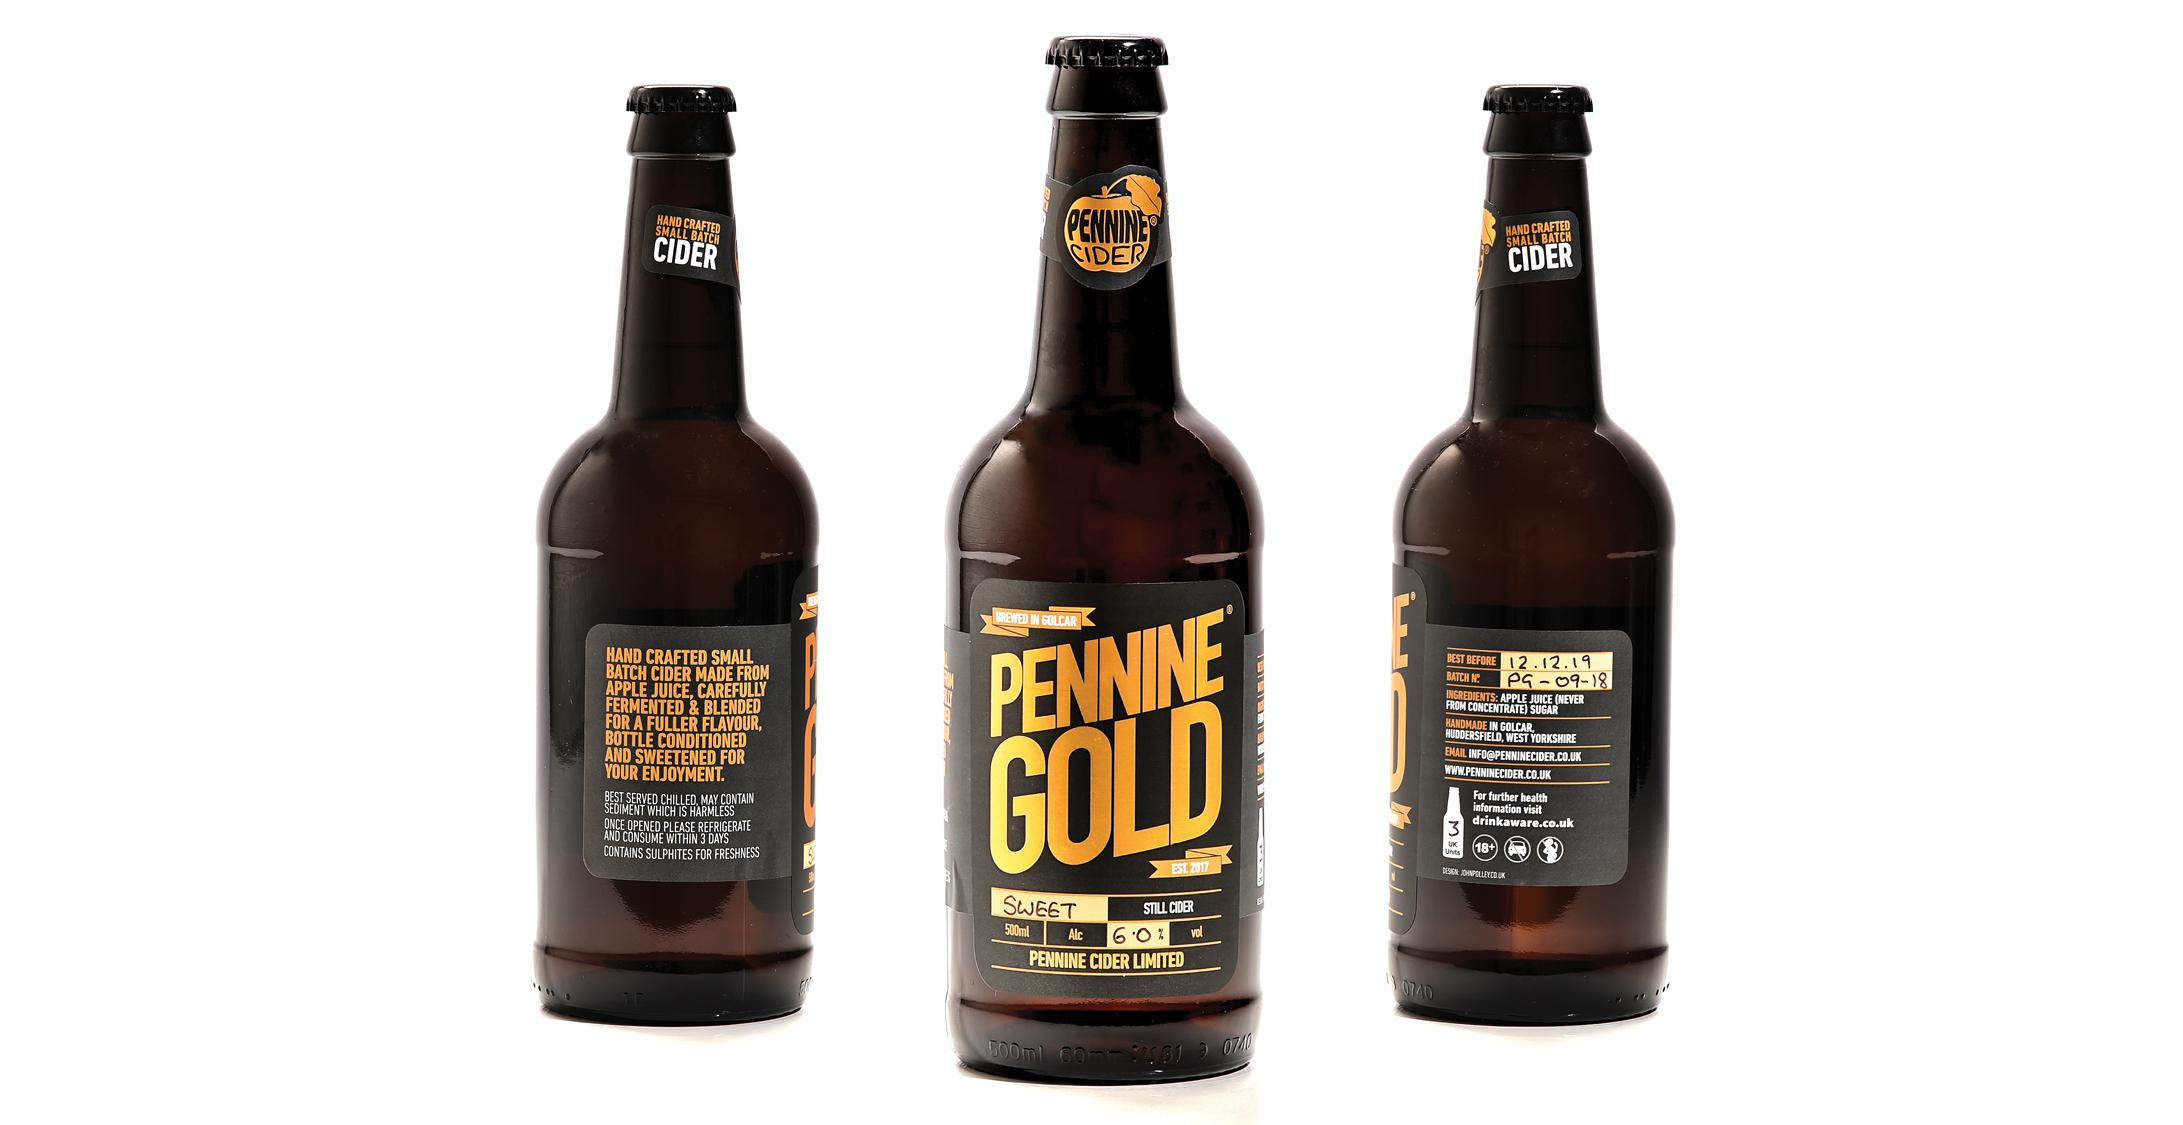 Pennine-Cider.jpg